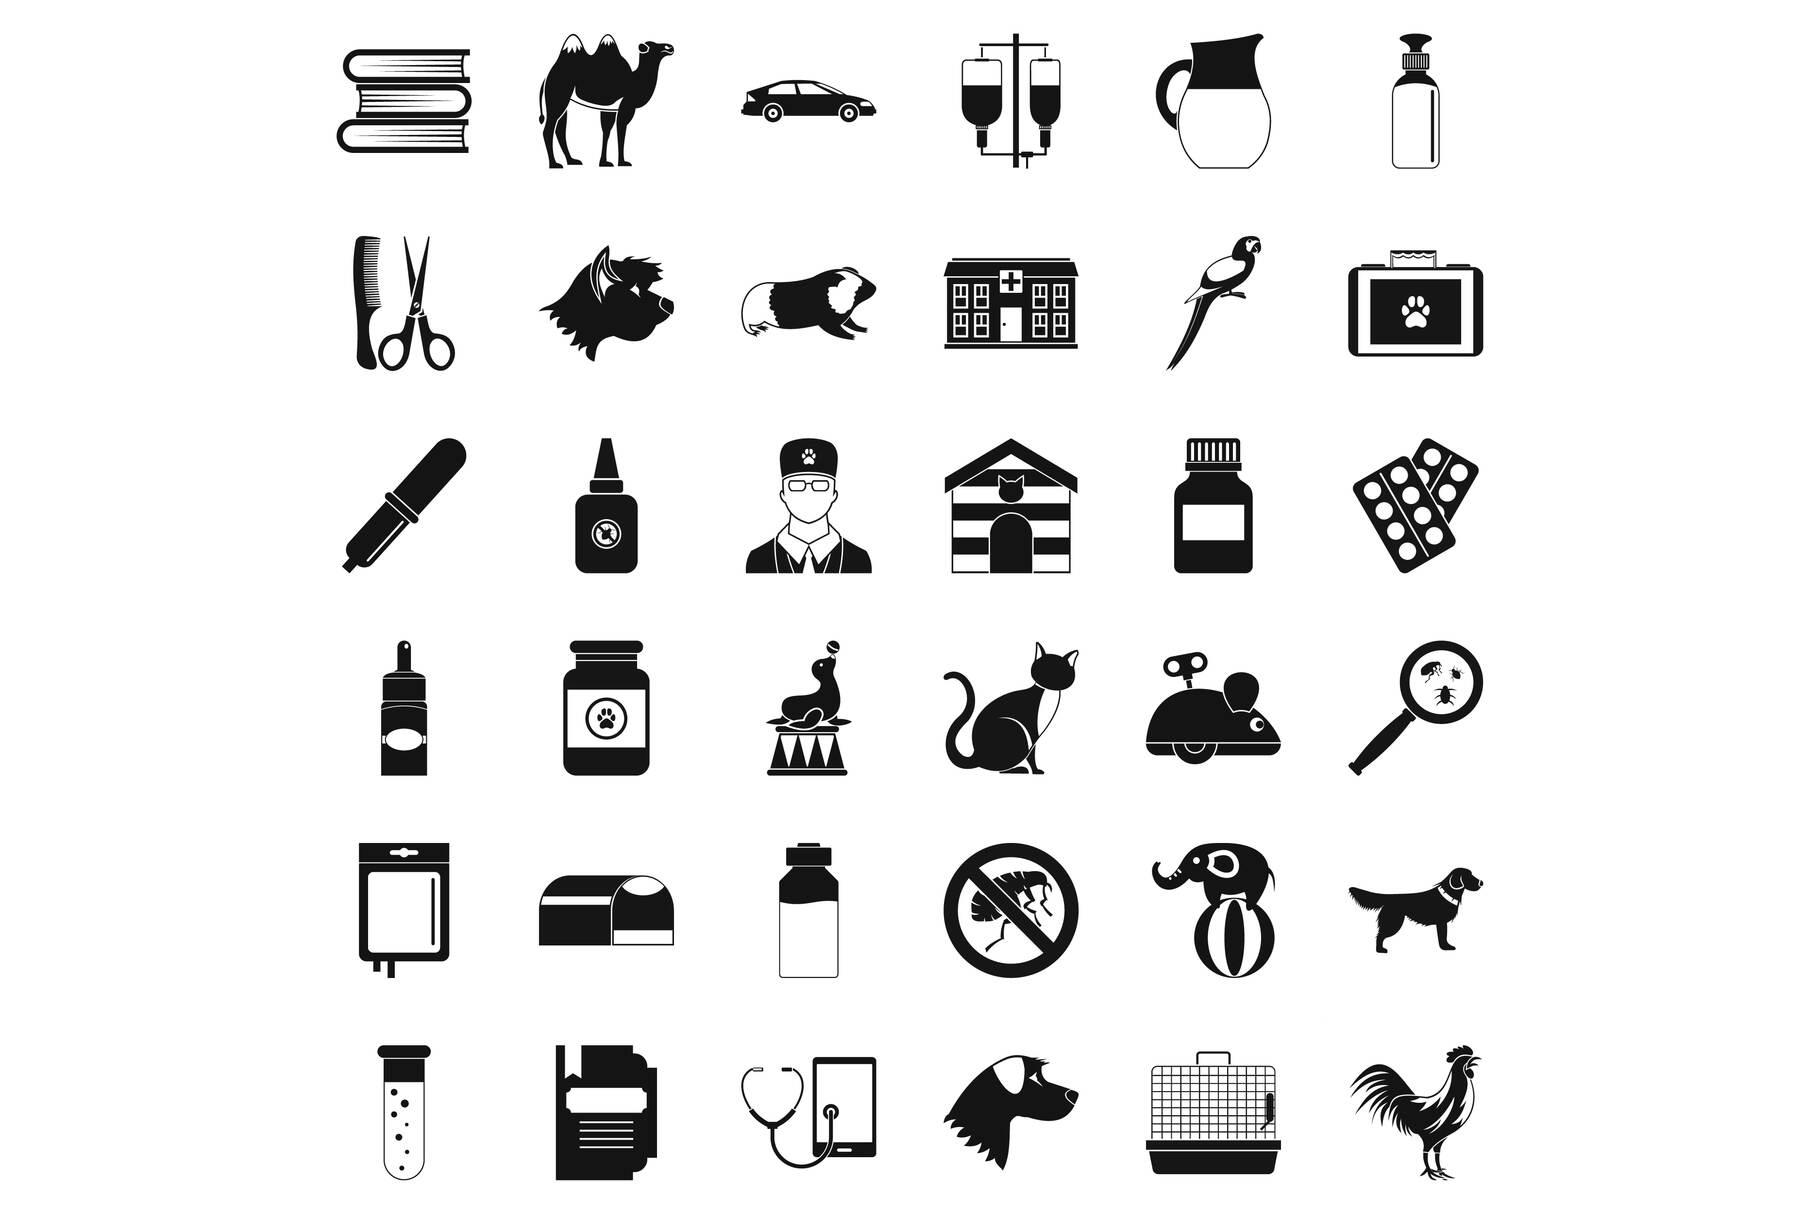 Veterinary illness icons set, simple style example image 1